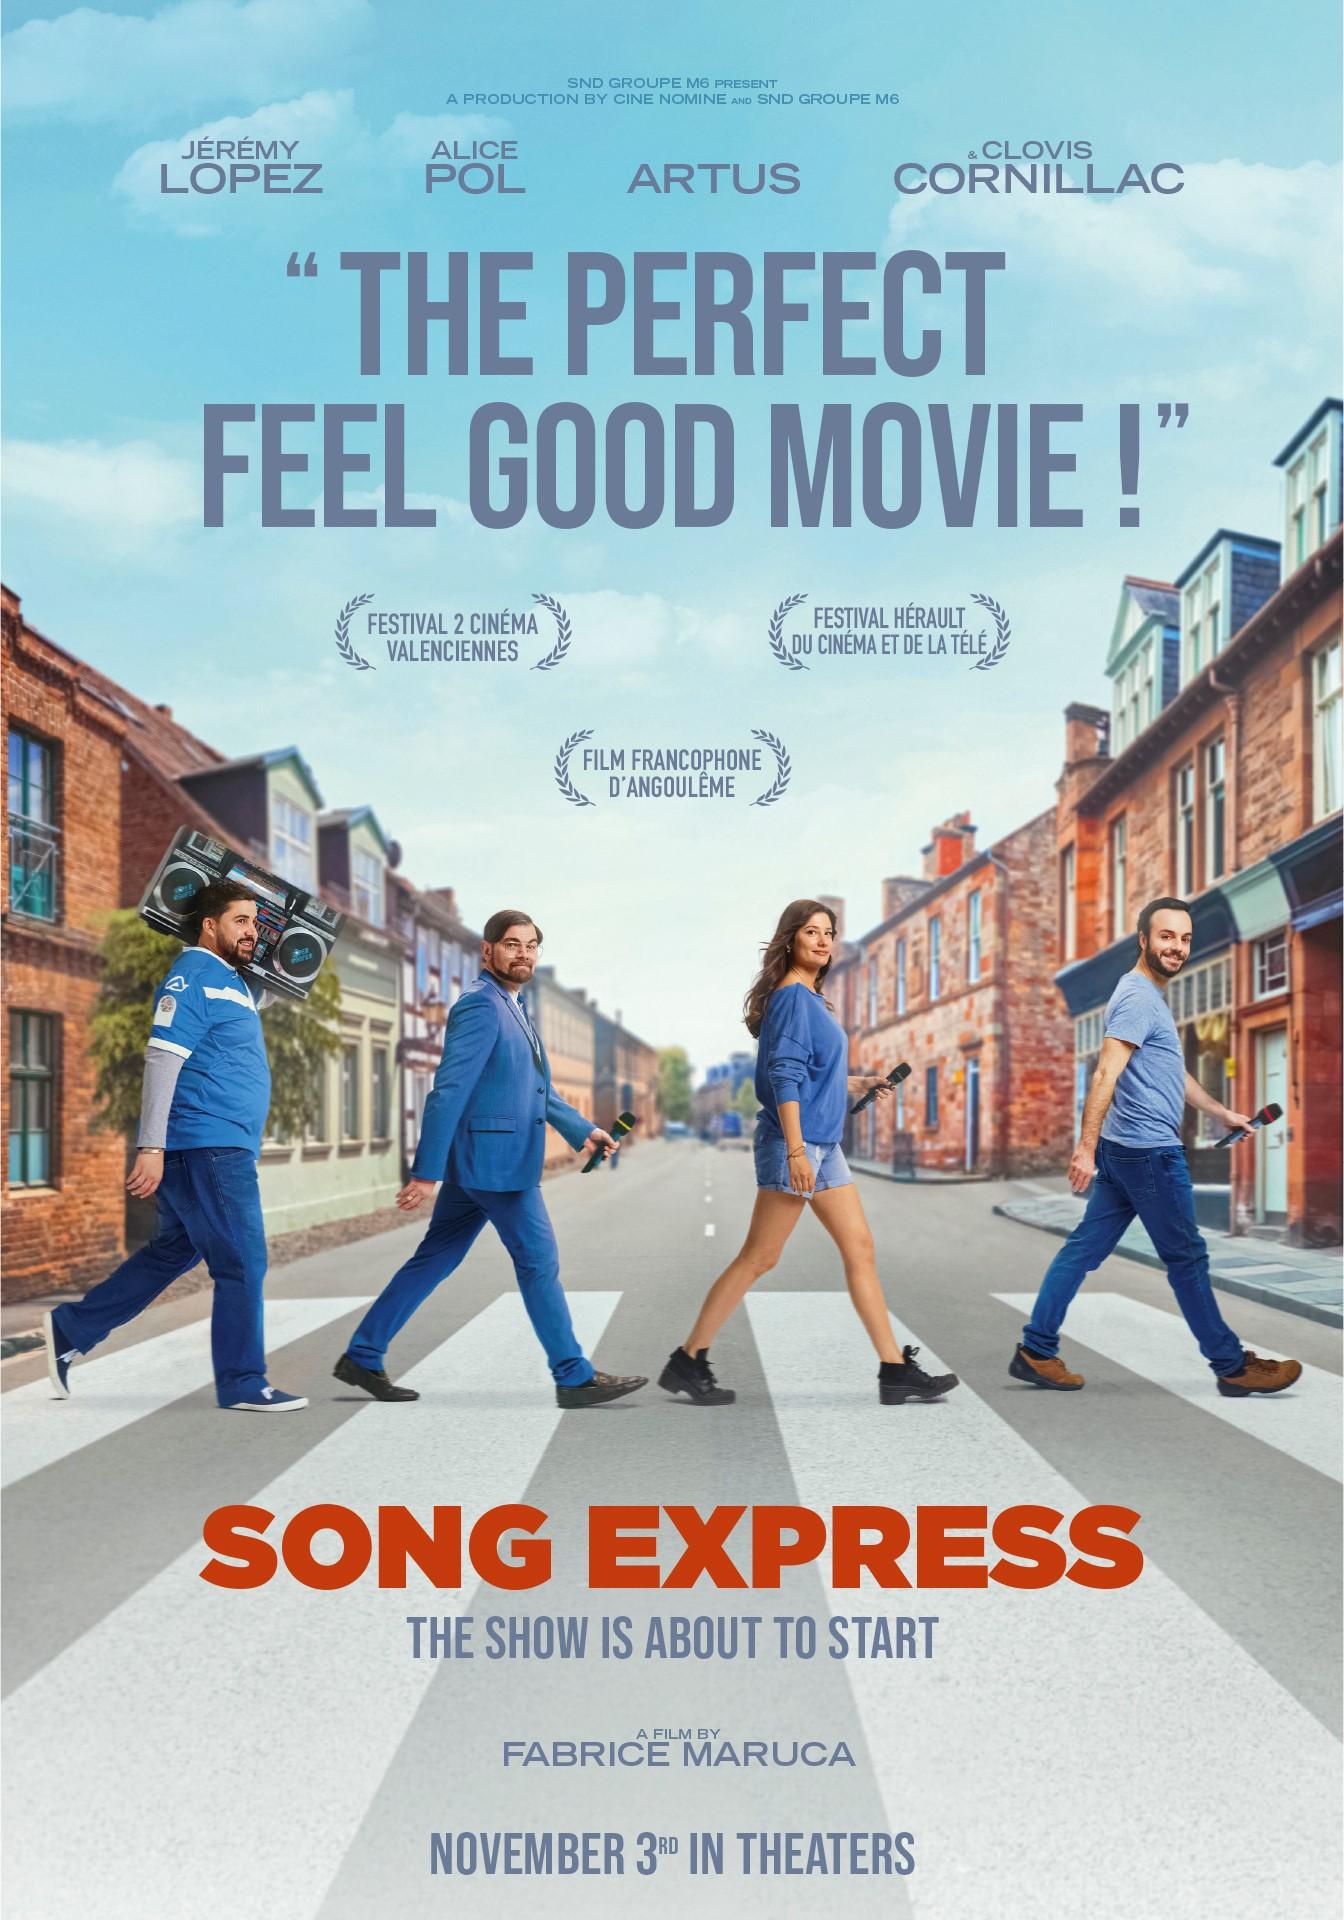 Song Express